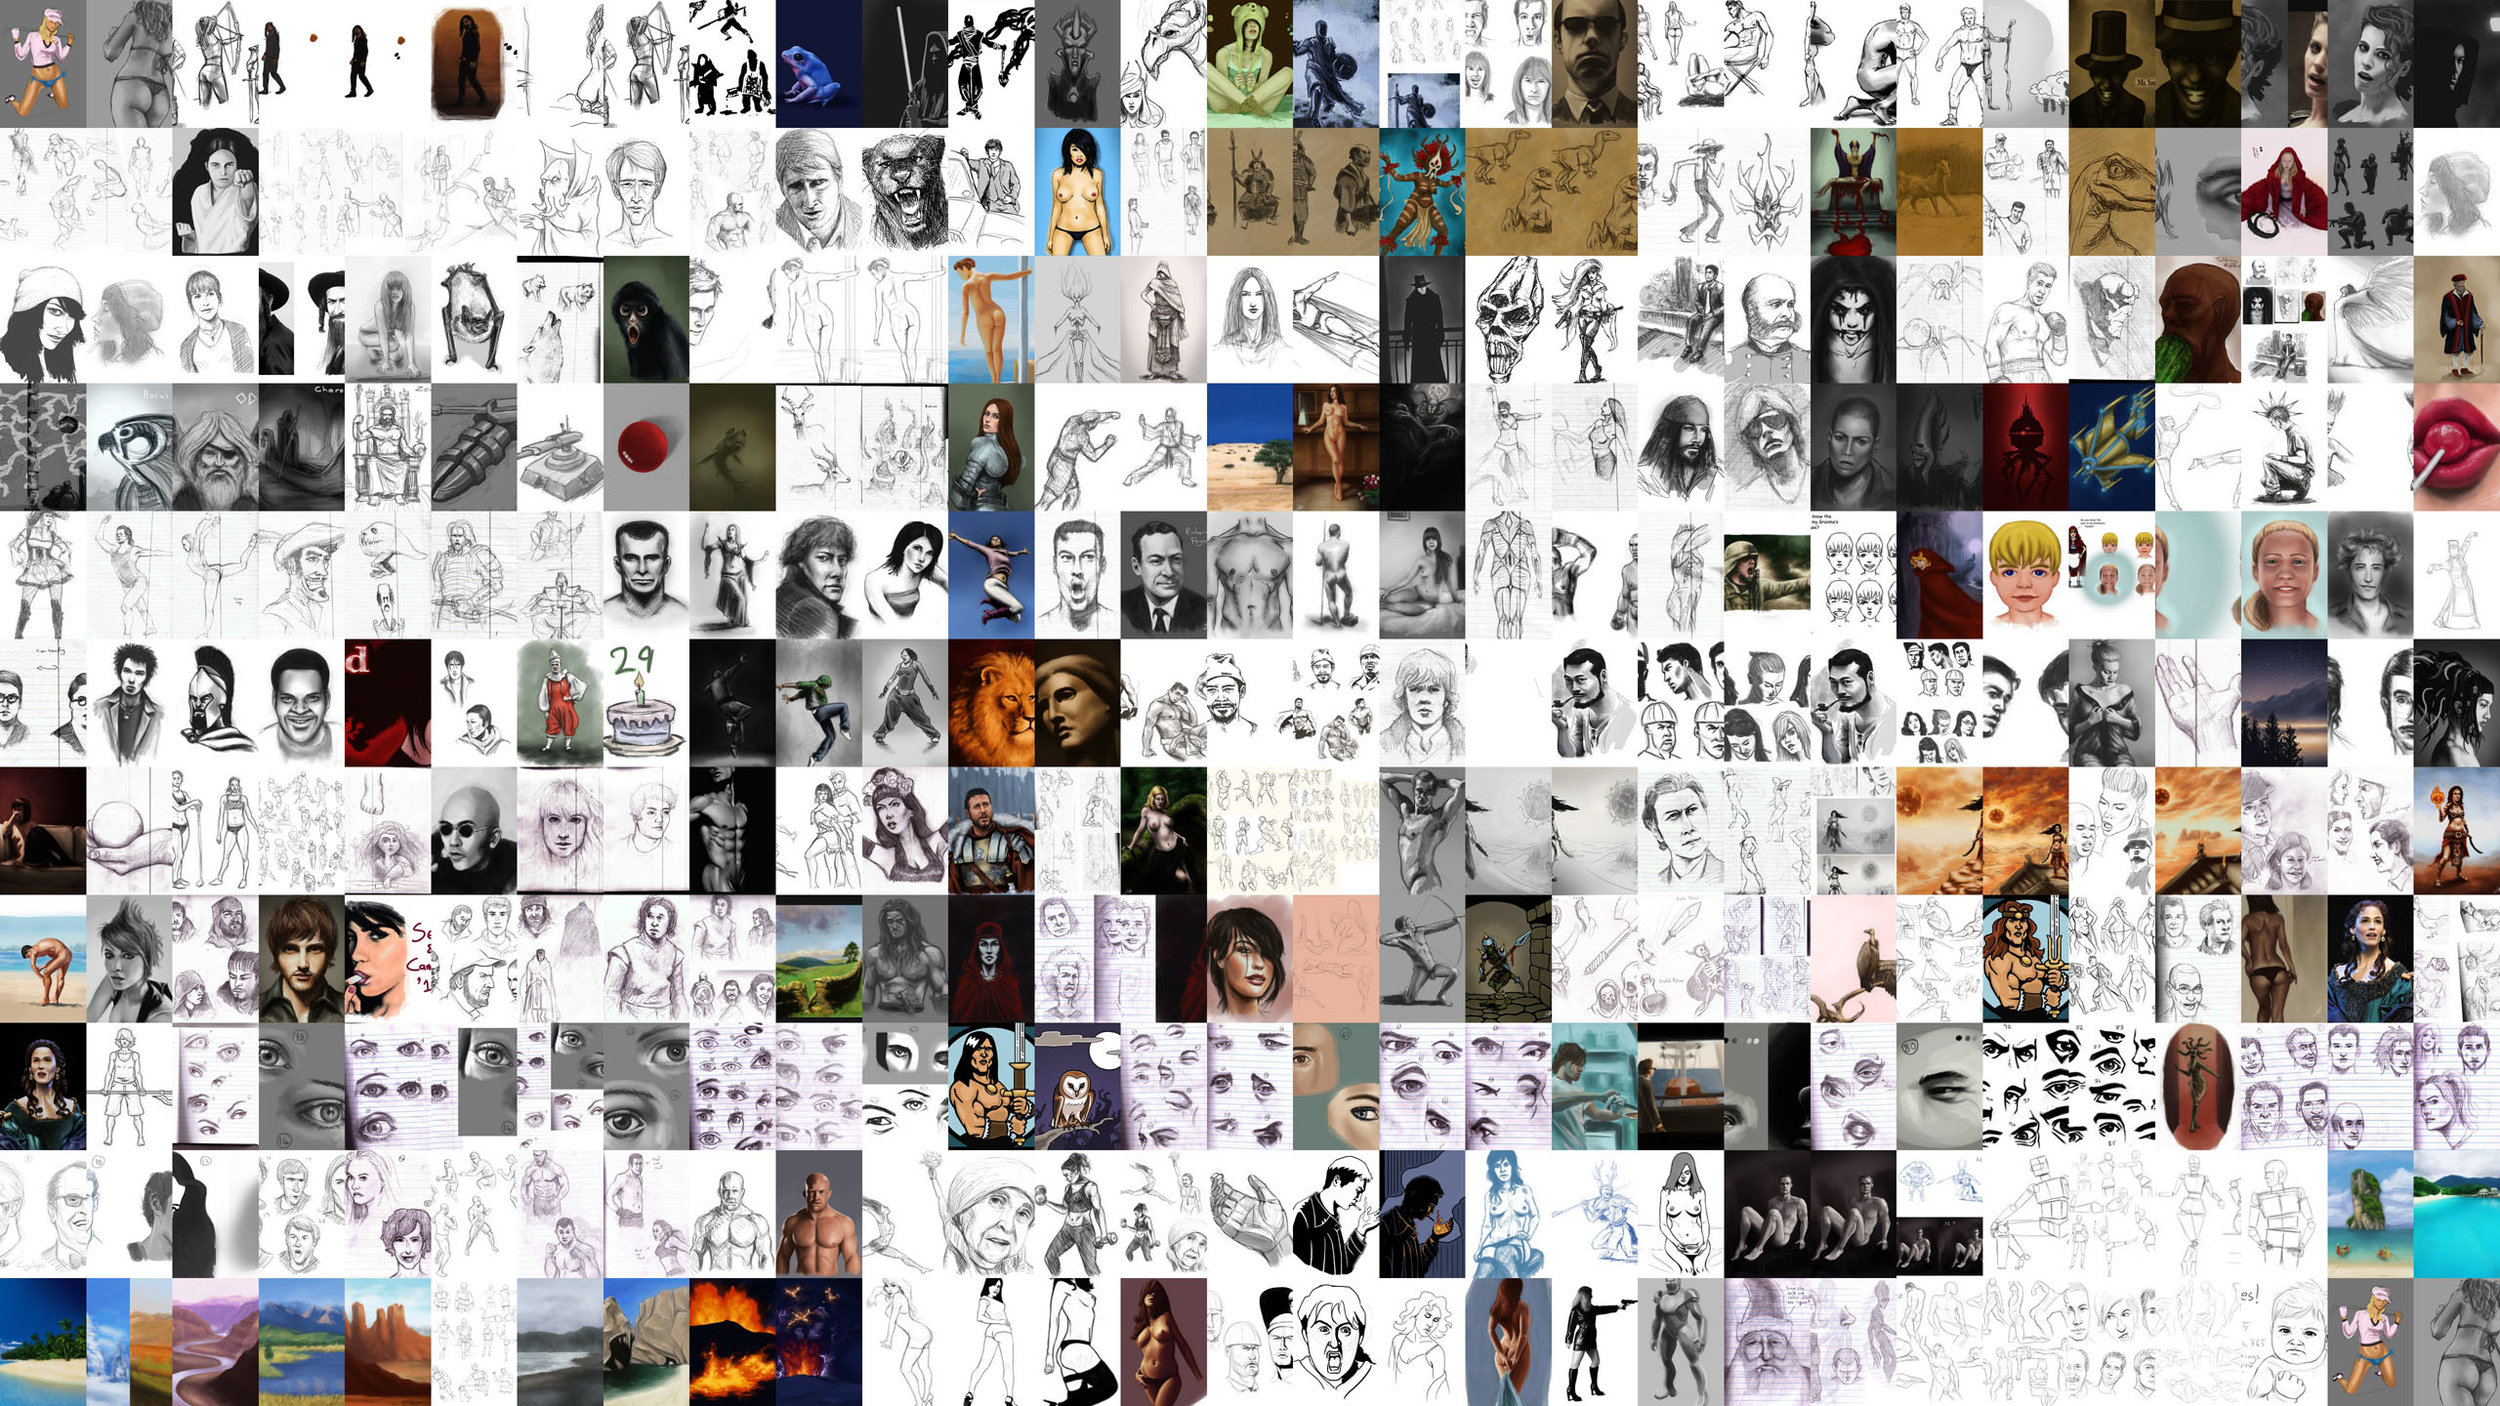 A year's worth of work by Gareth Fouche